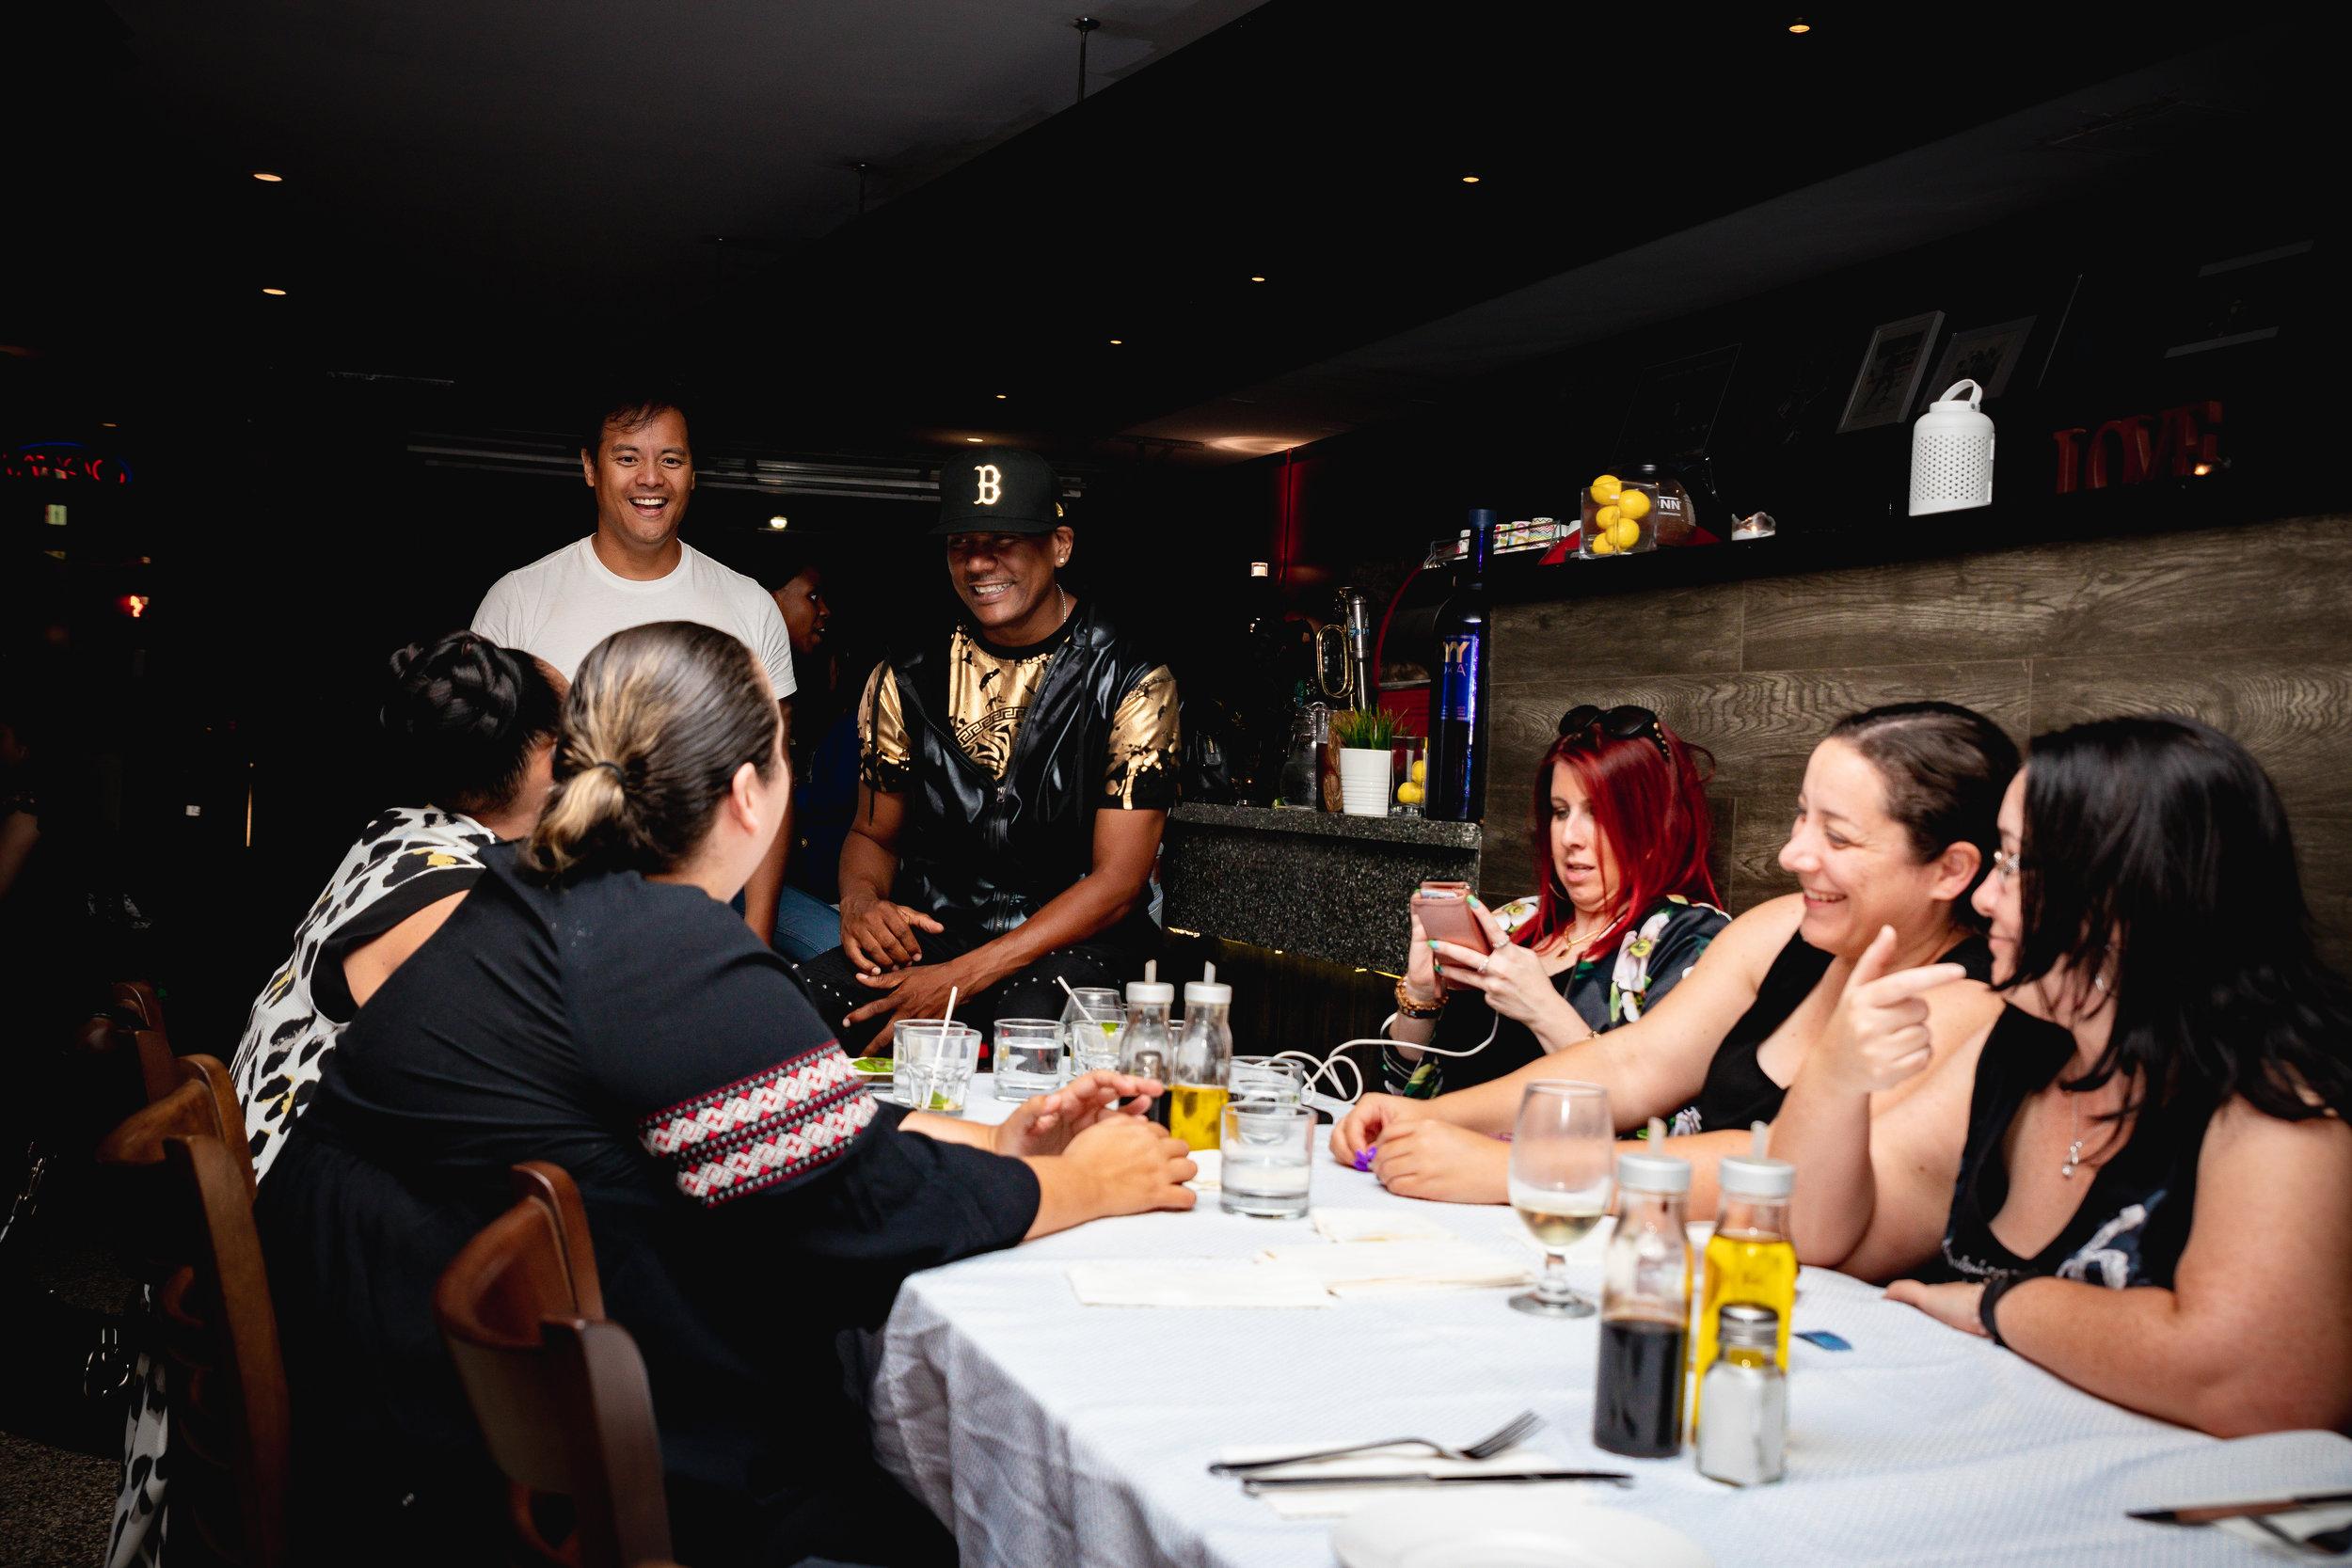 Scottie G of The Funky Bunch Live @ Salto Restaurant - Proofs-40.jpg